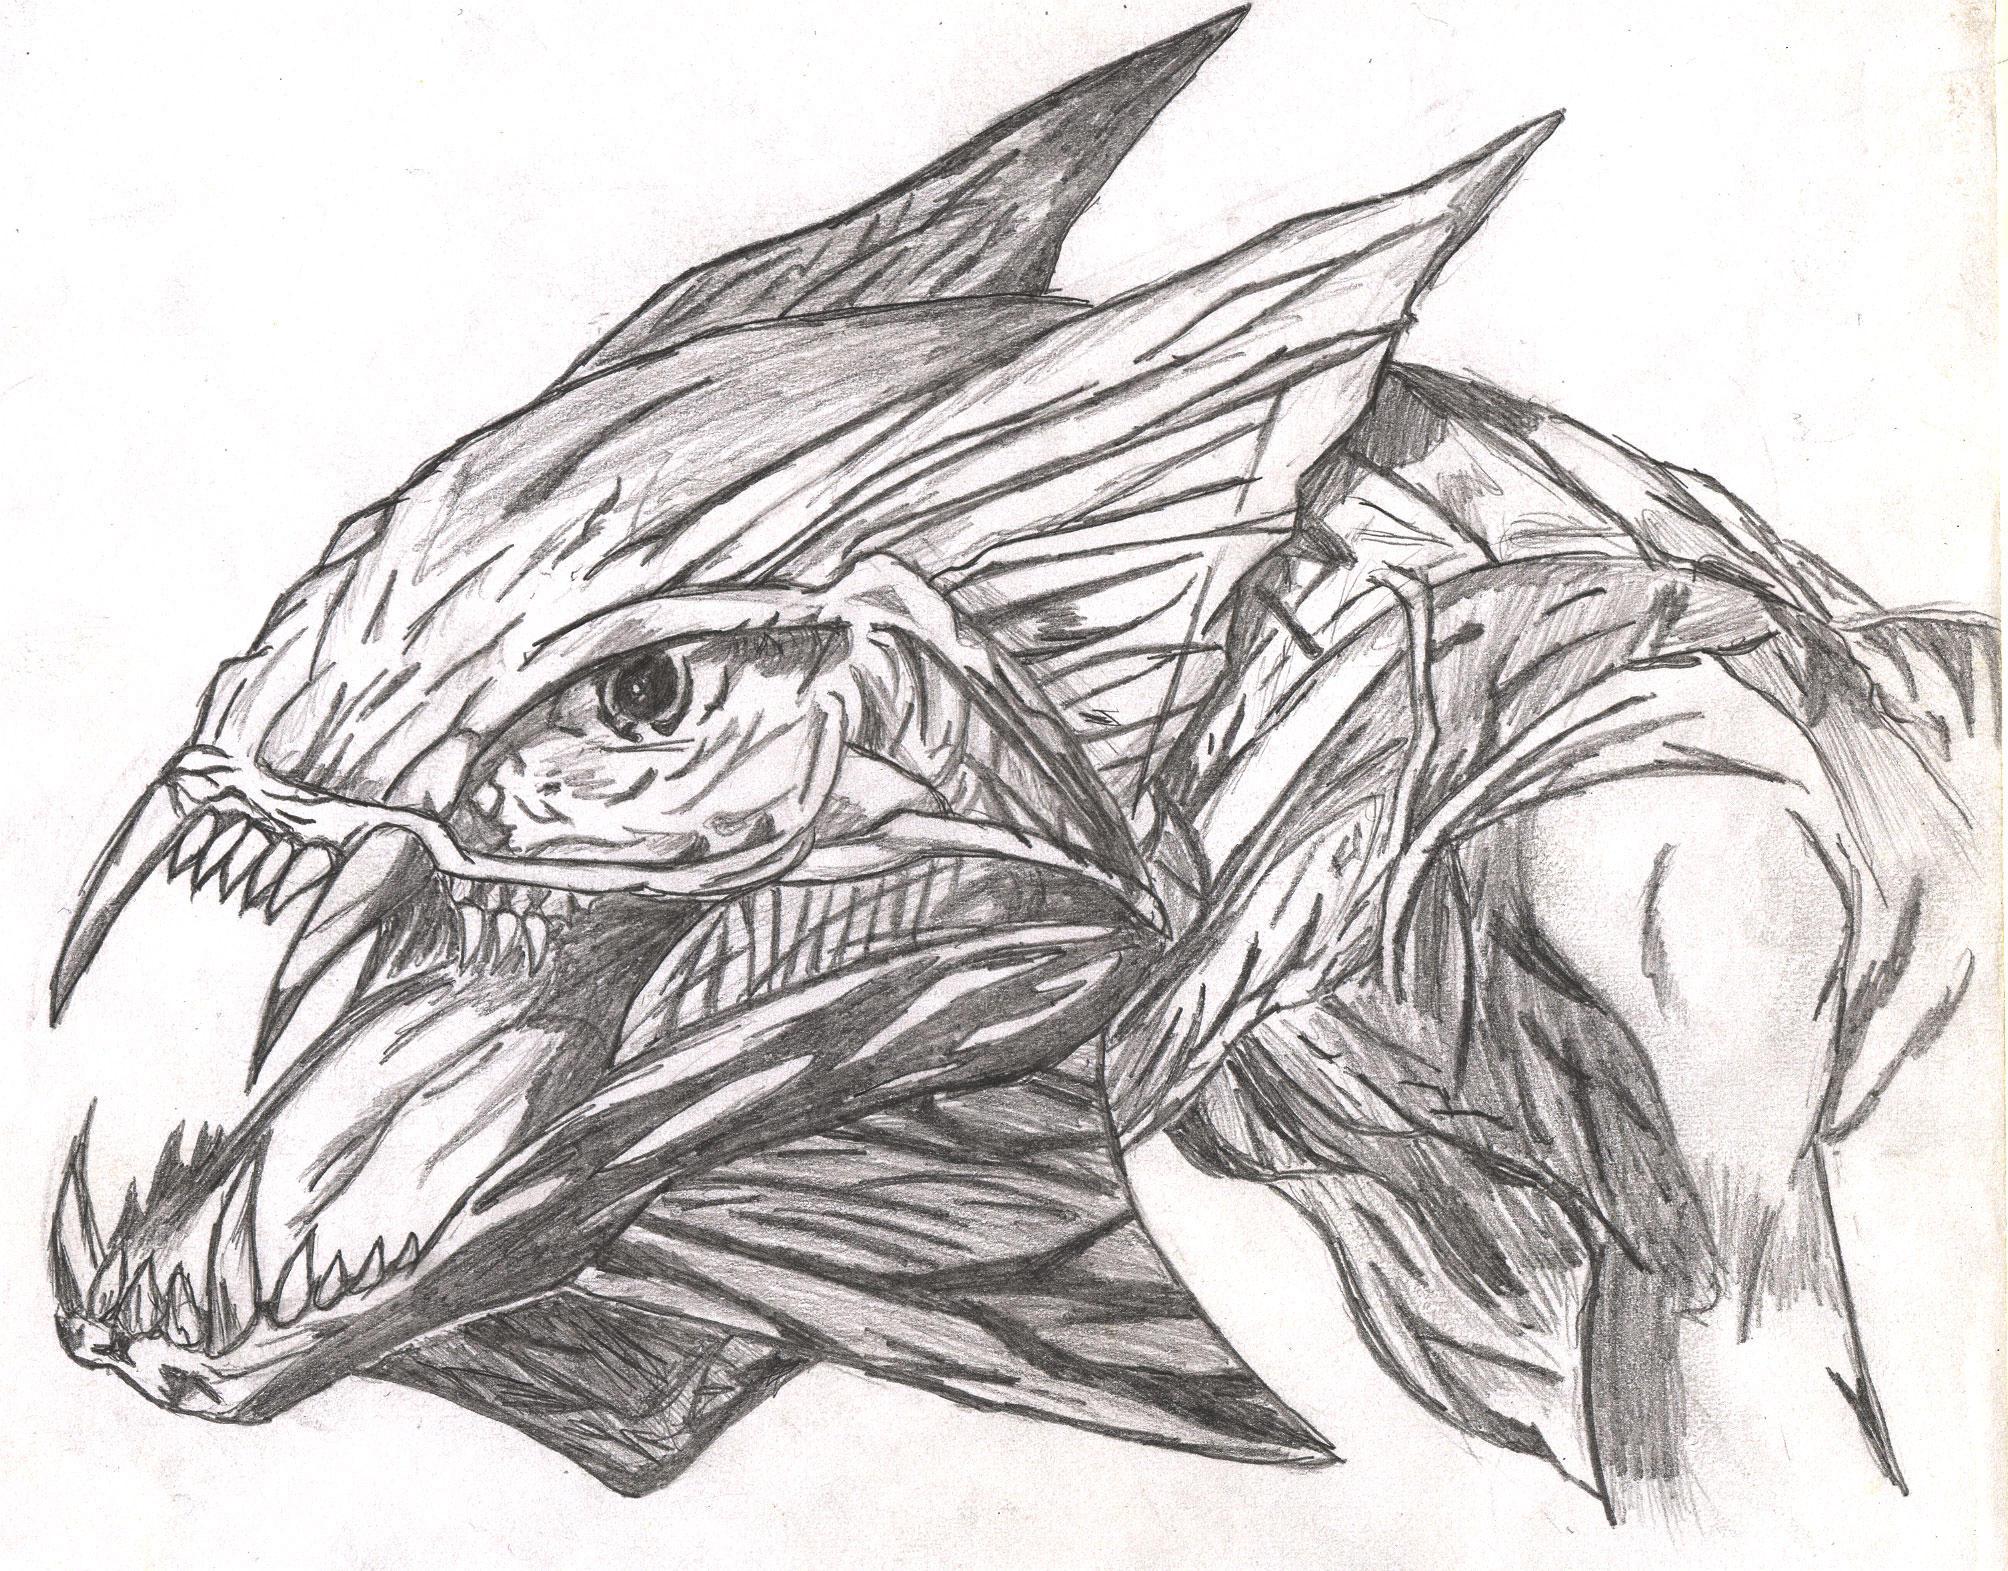 Dragon head sketch by Avantasian on DeviantArt